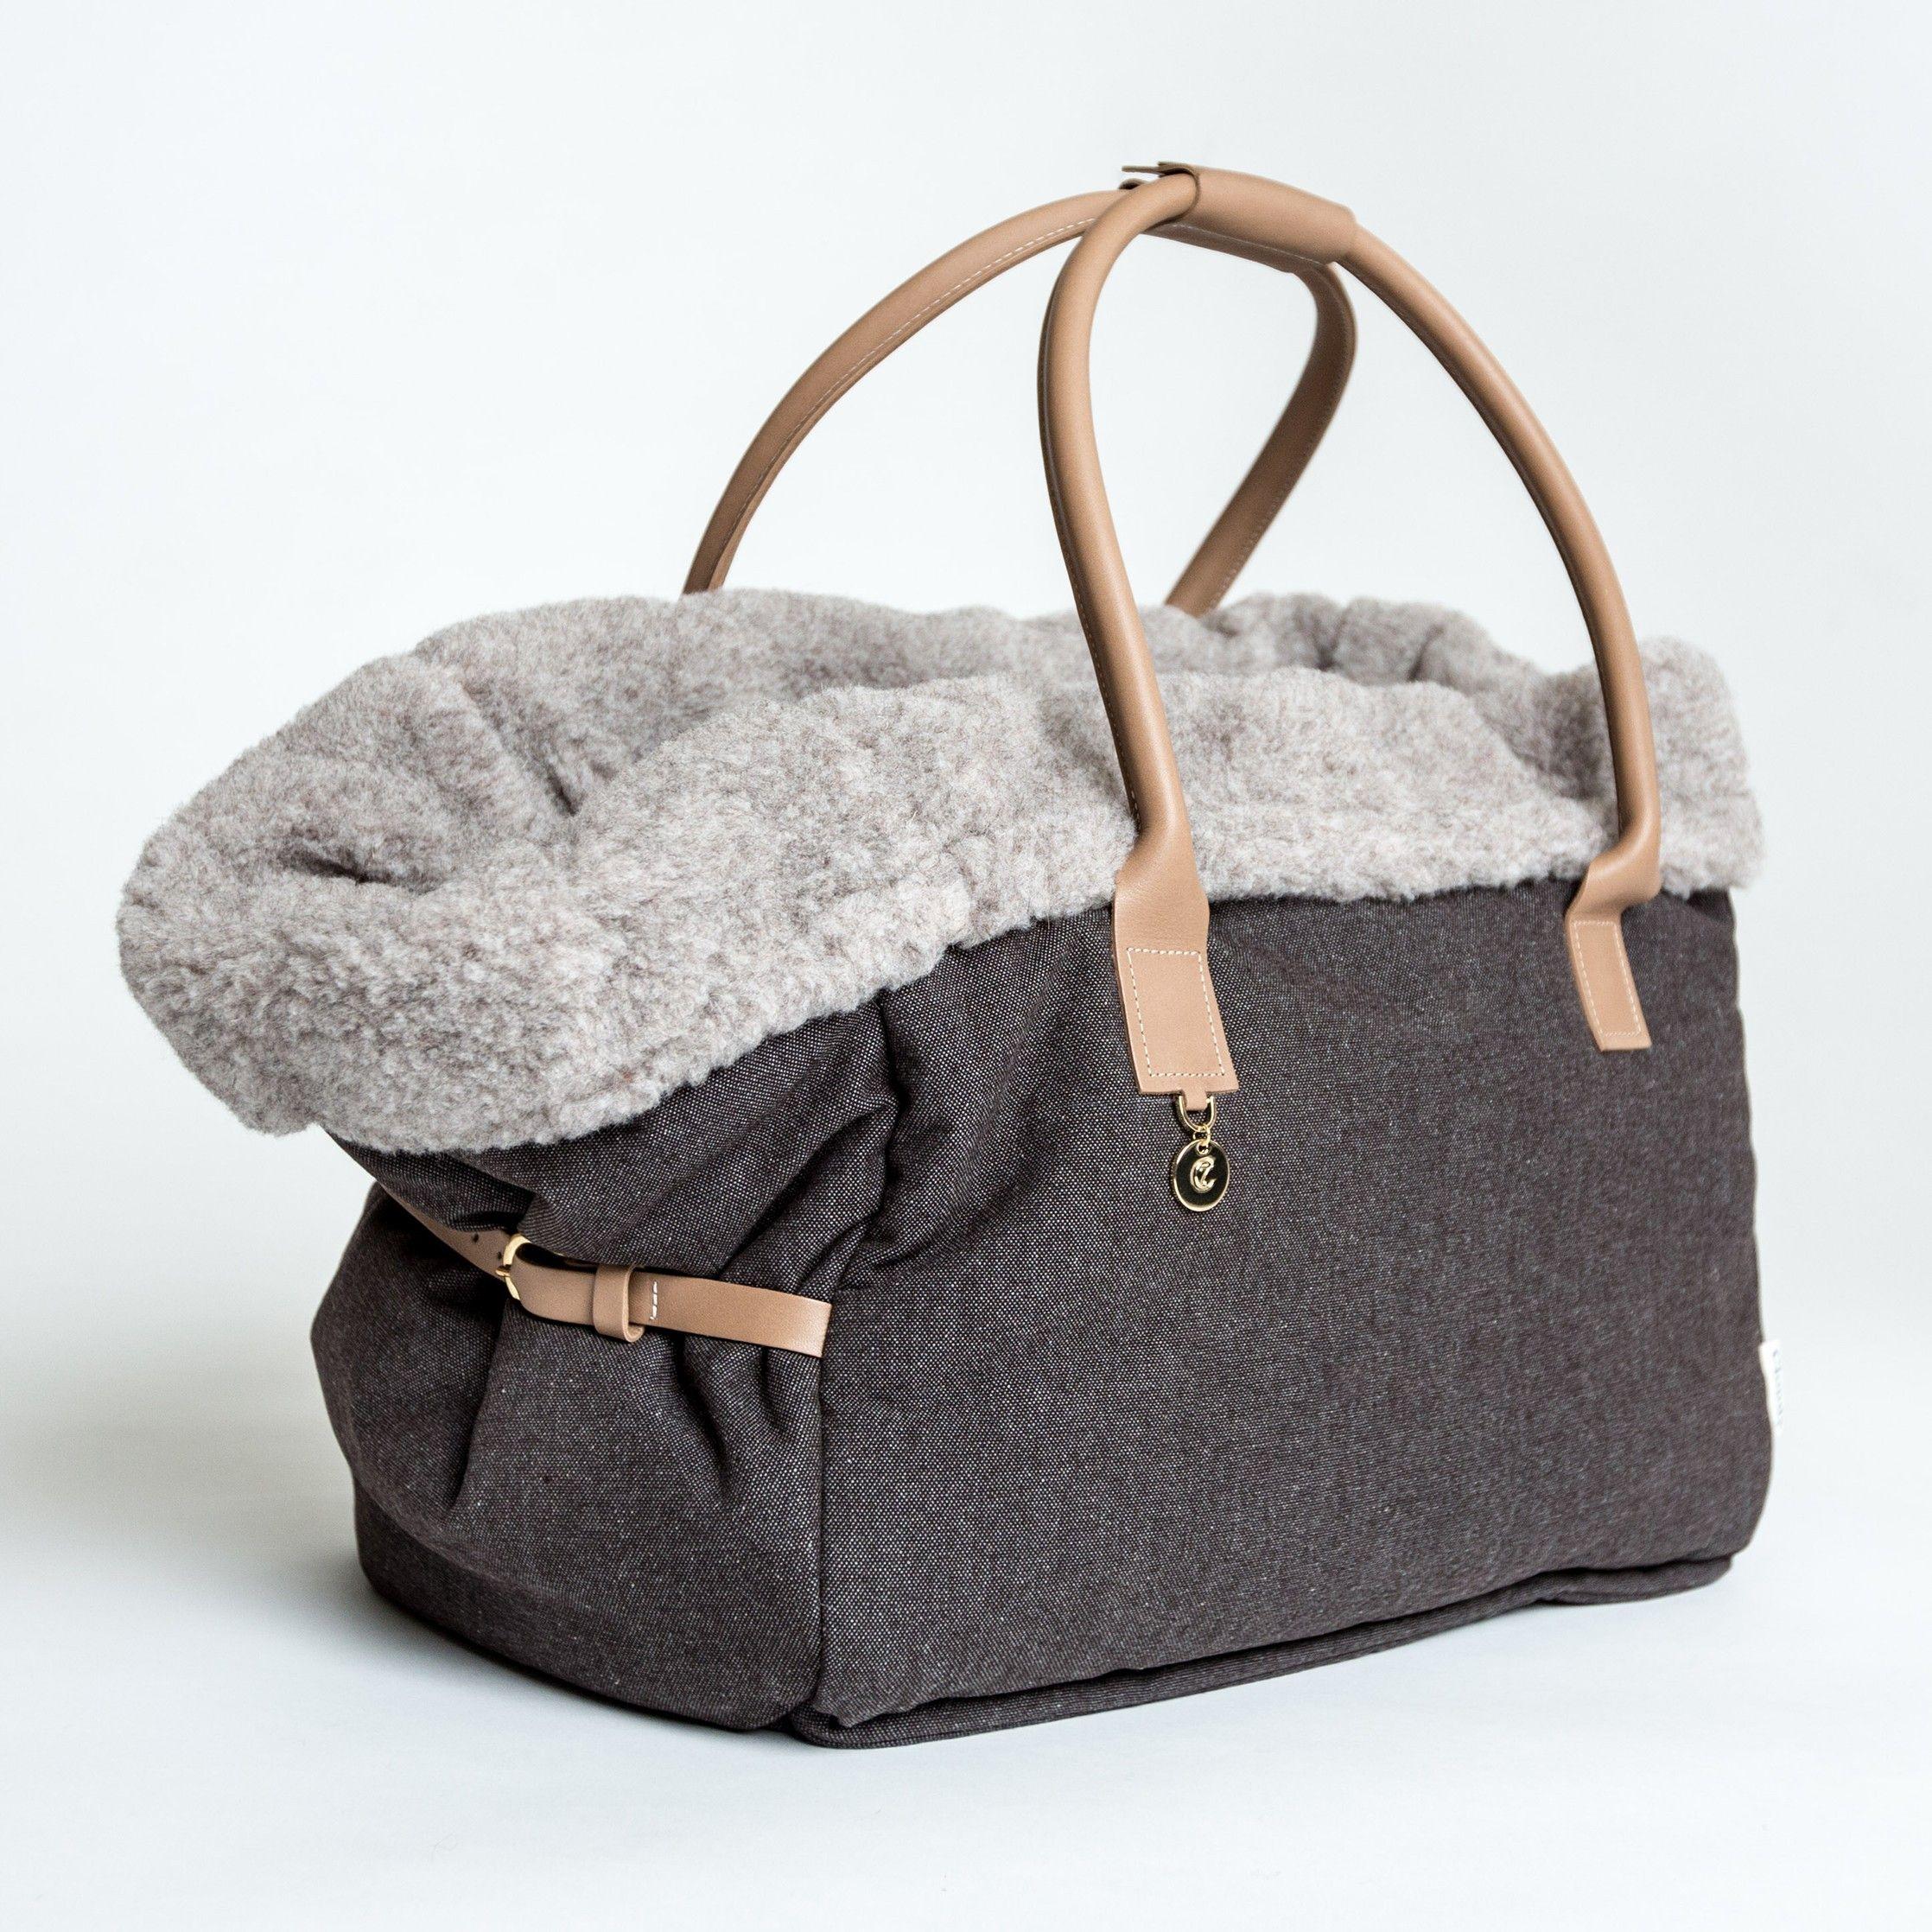 Dog Bag City Carrier Heather Brown | Pinterest | Hunde und Nähen